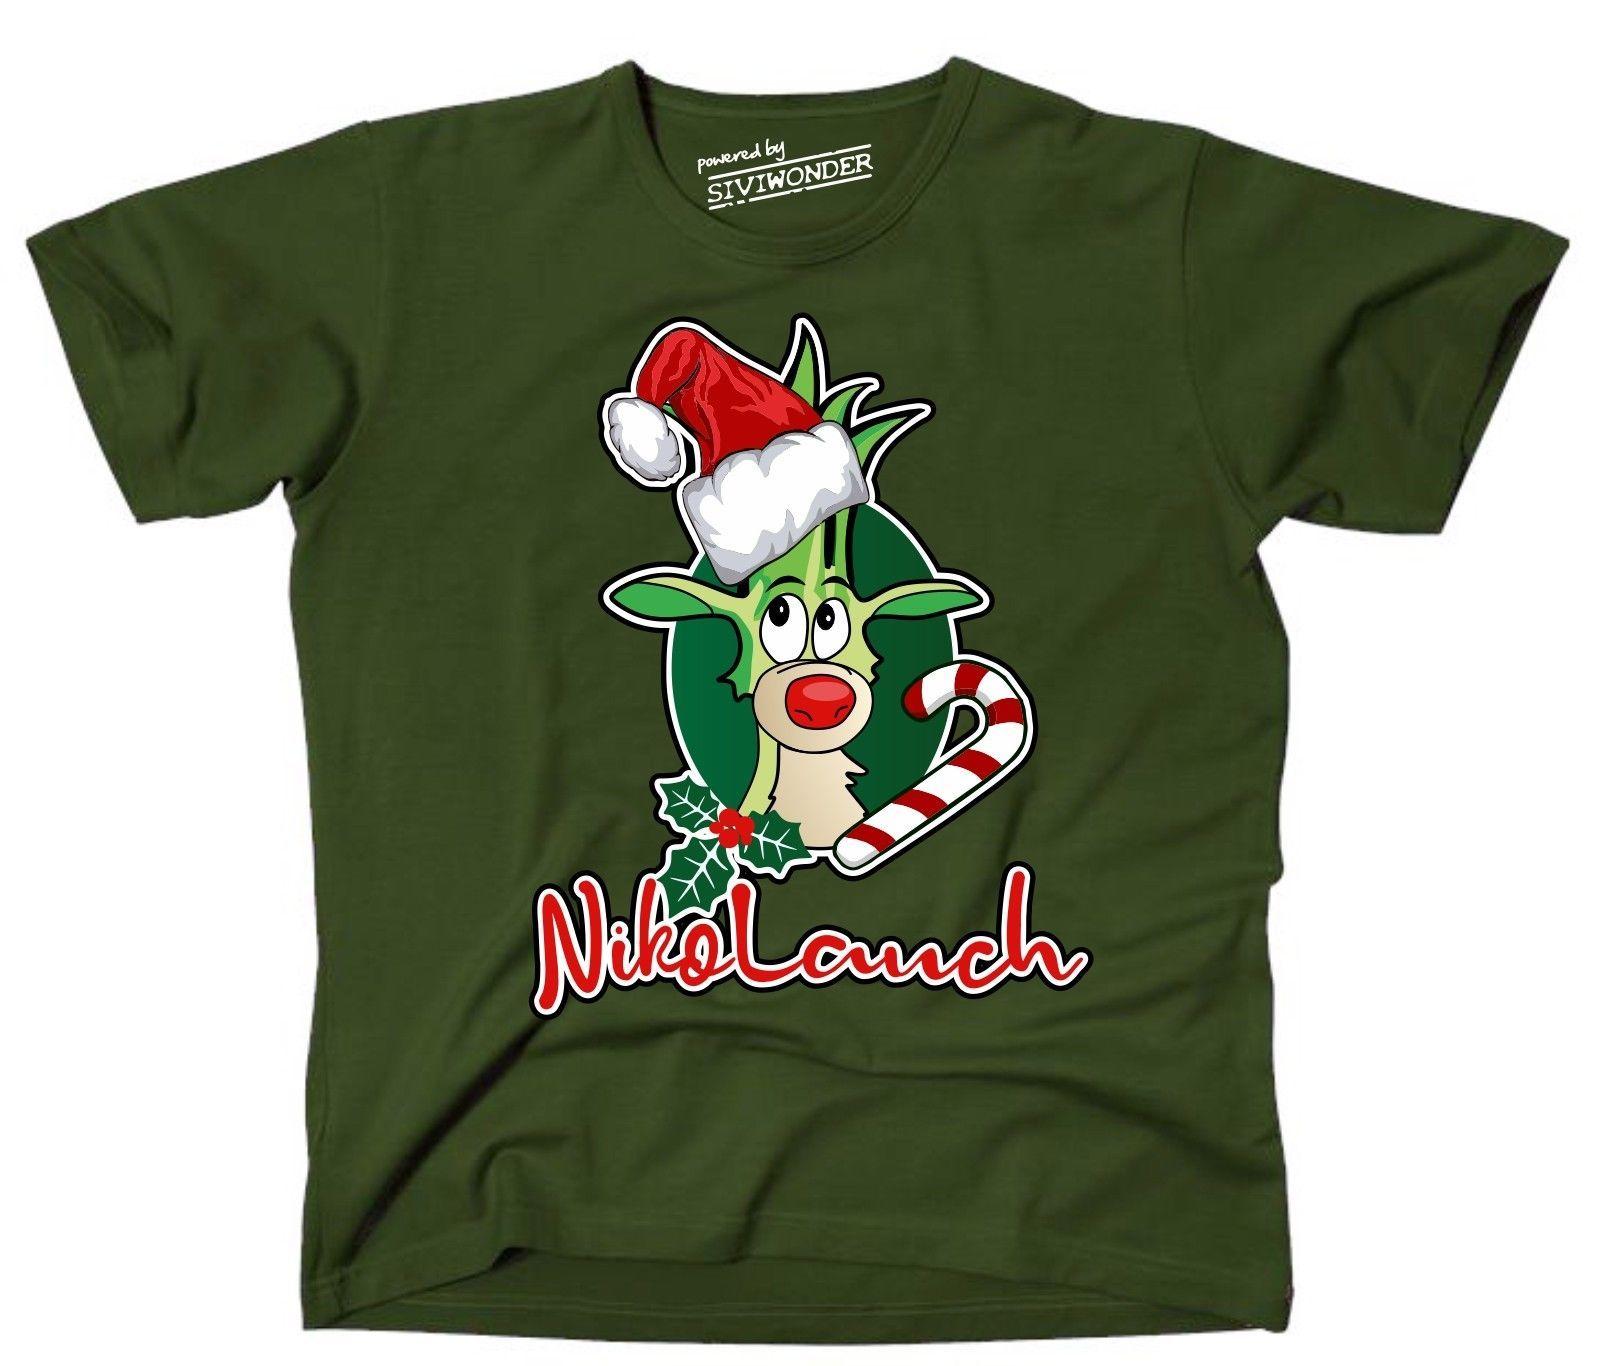 2018 New Fashion T Shirt Brand Hip T Shirt Lauch Nikolauch Nikolaus